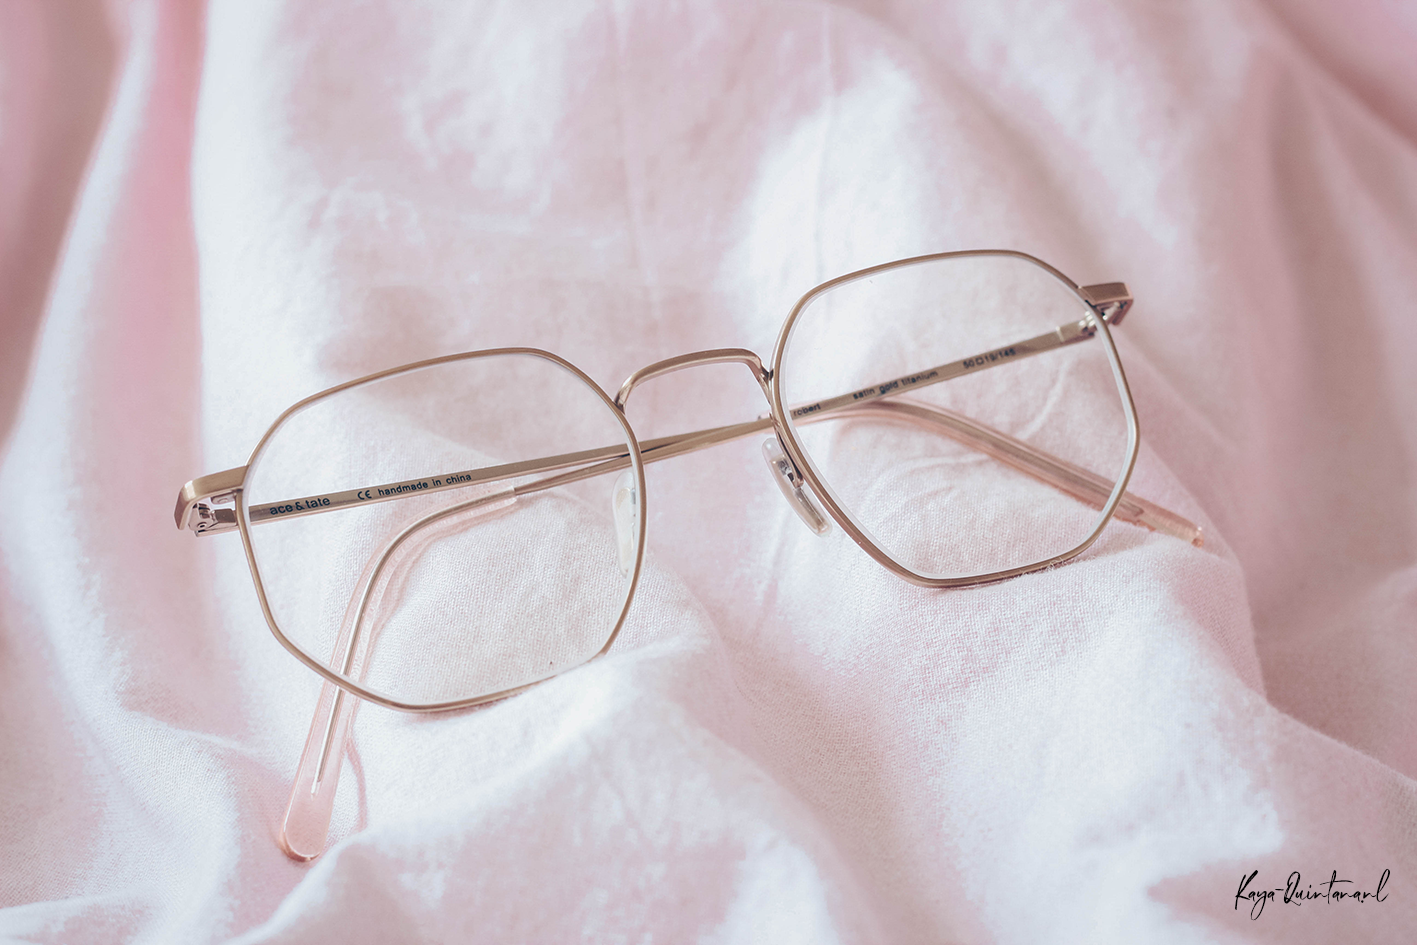 hexagon shaped glasses